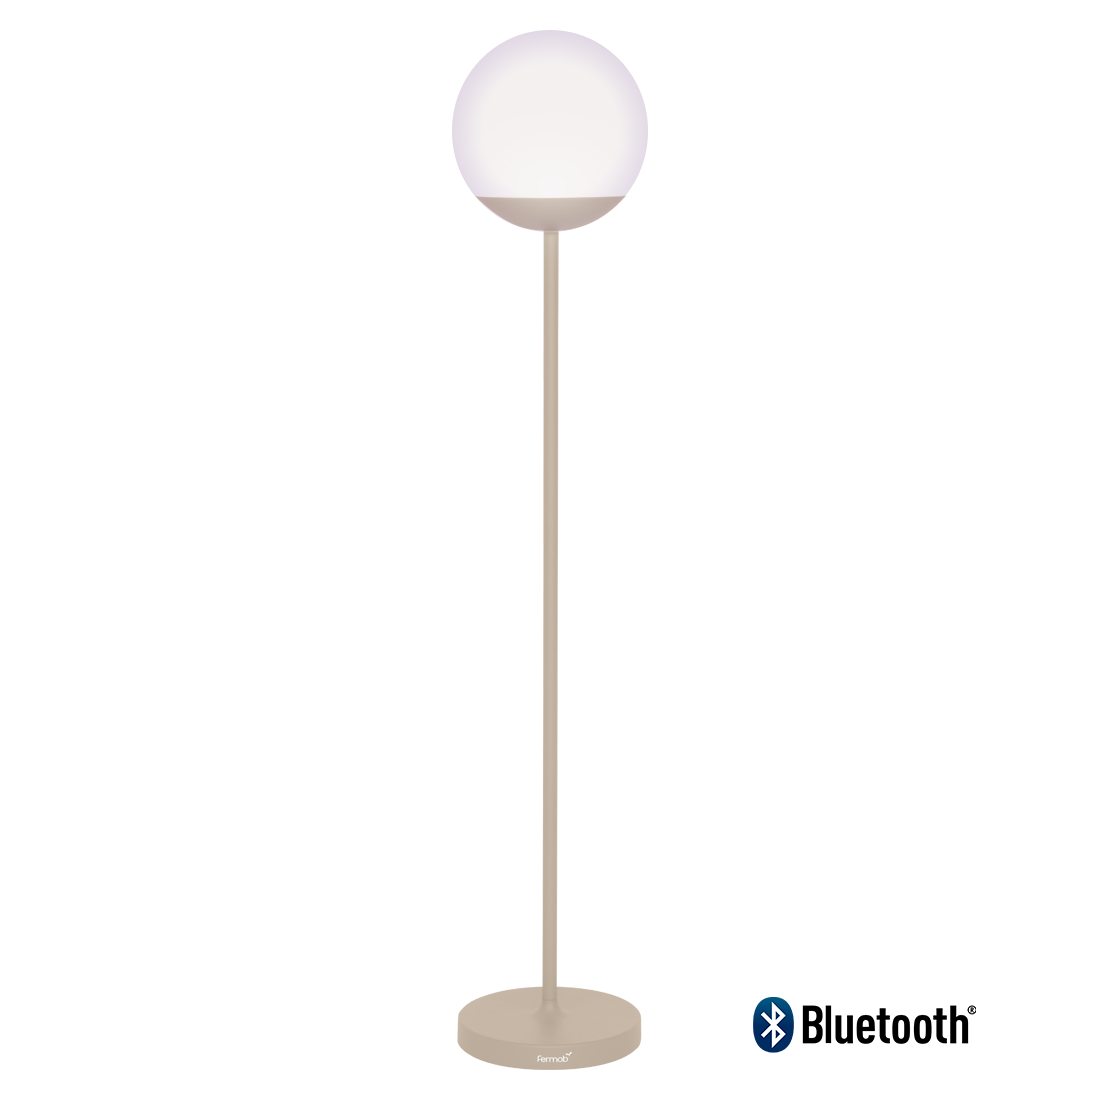 lampe fermob, lampadaire, lampe outdoor, lampe d exterieur, lampe beige